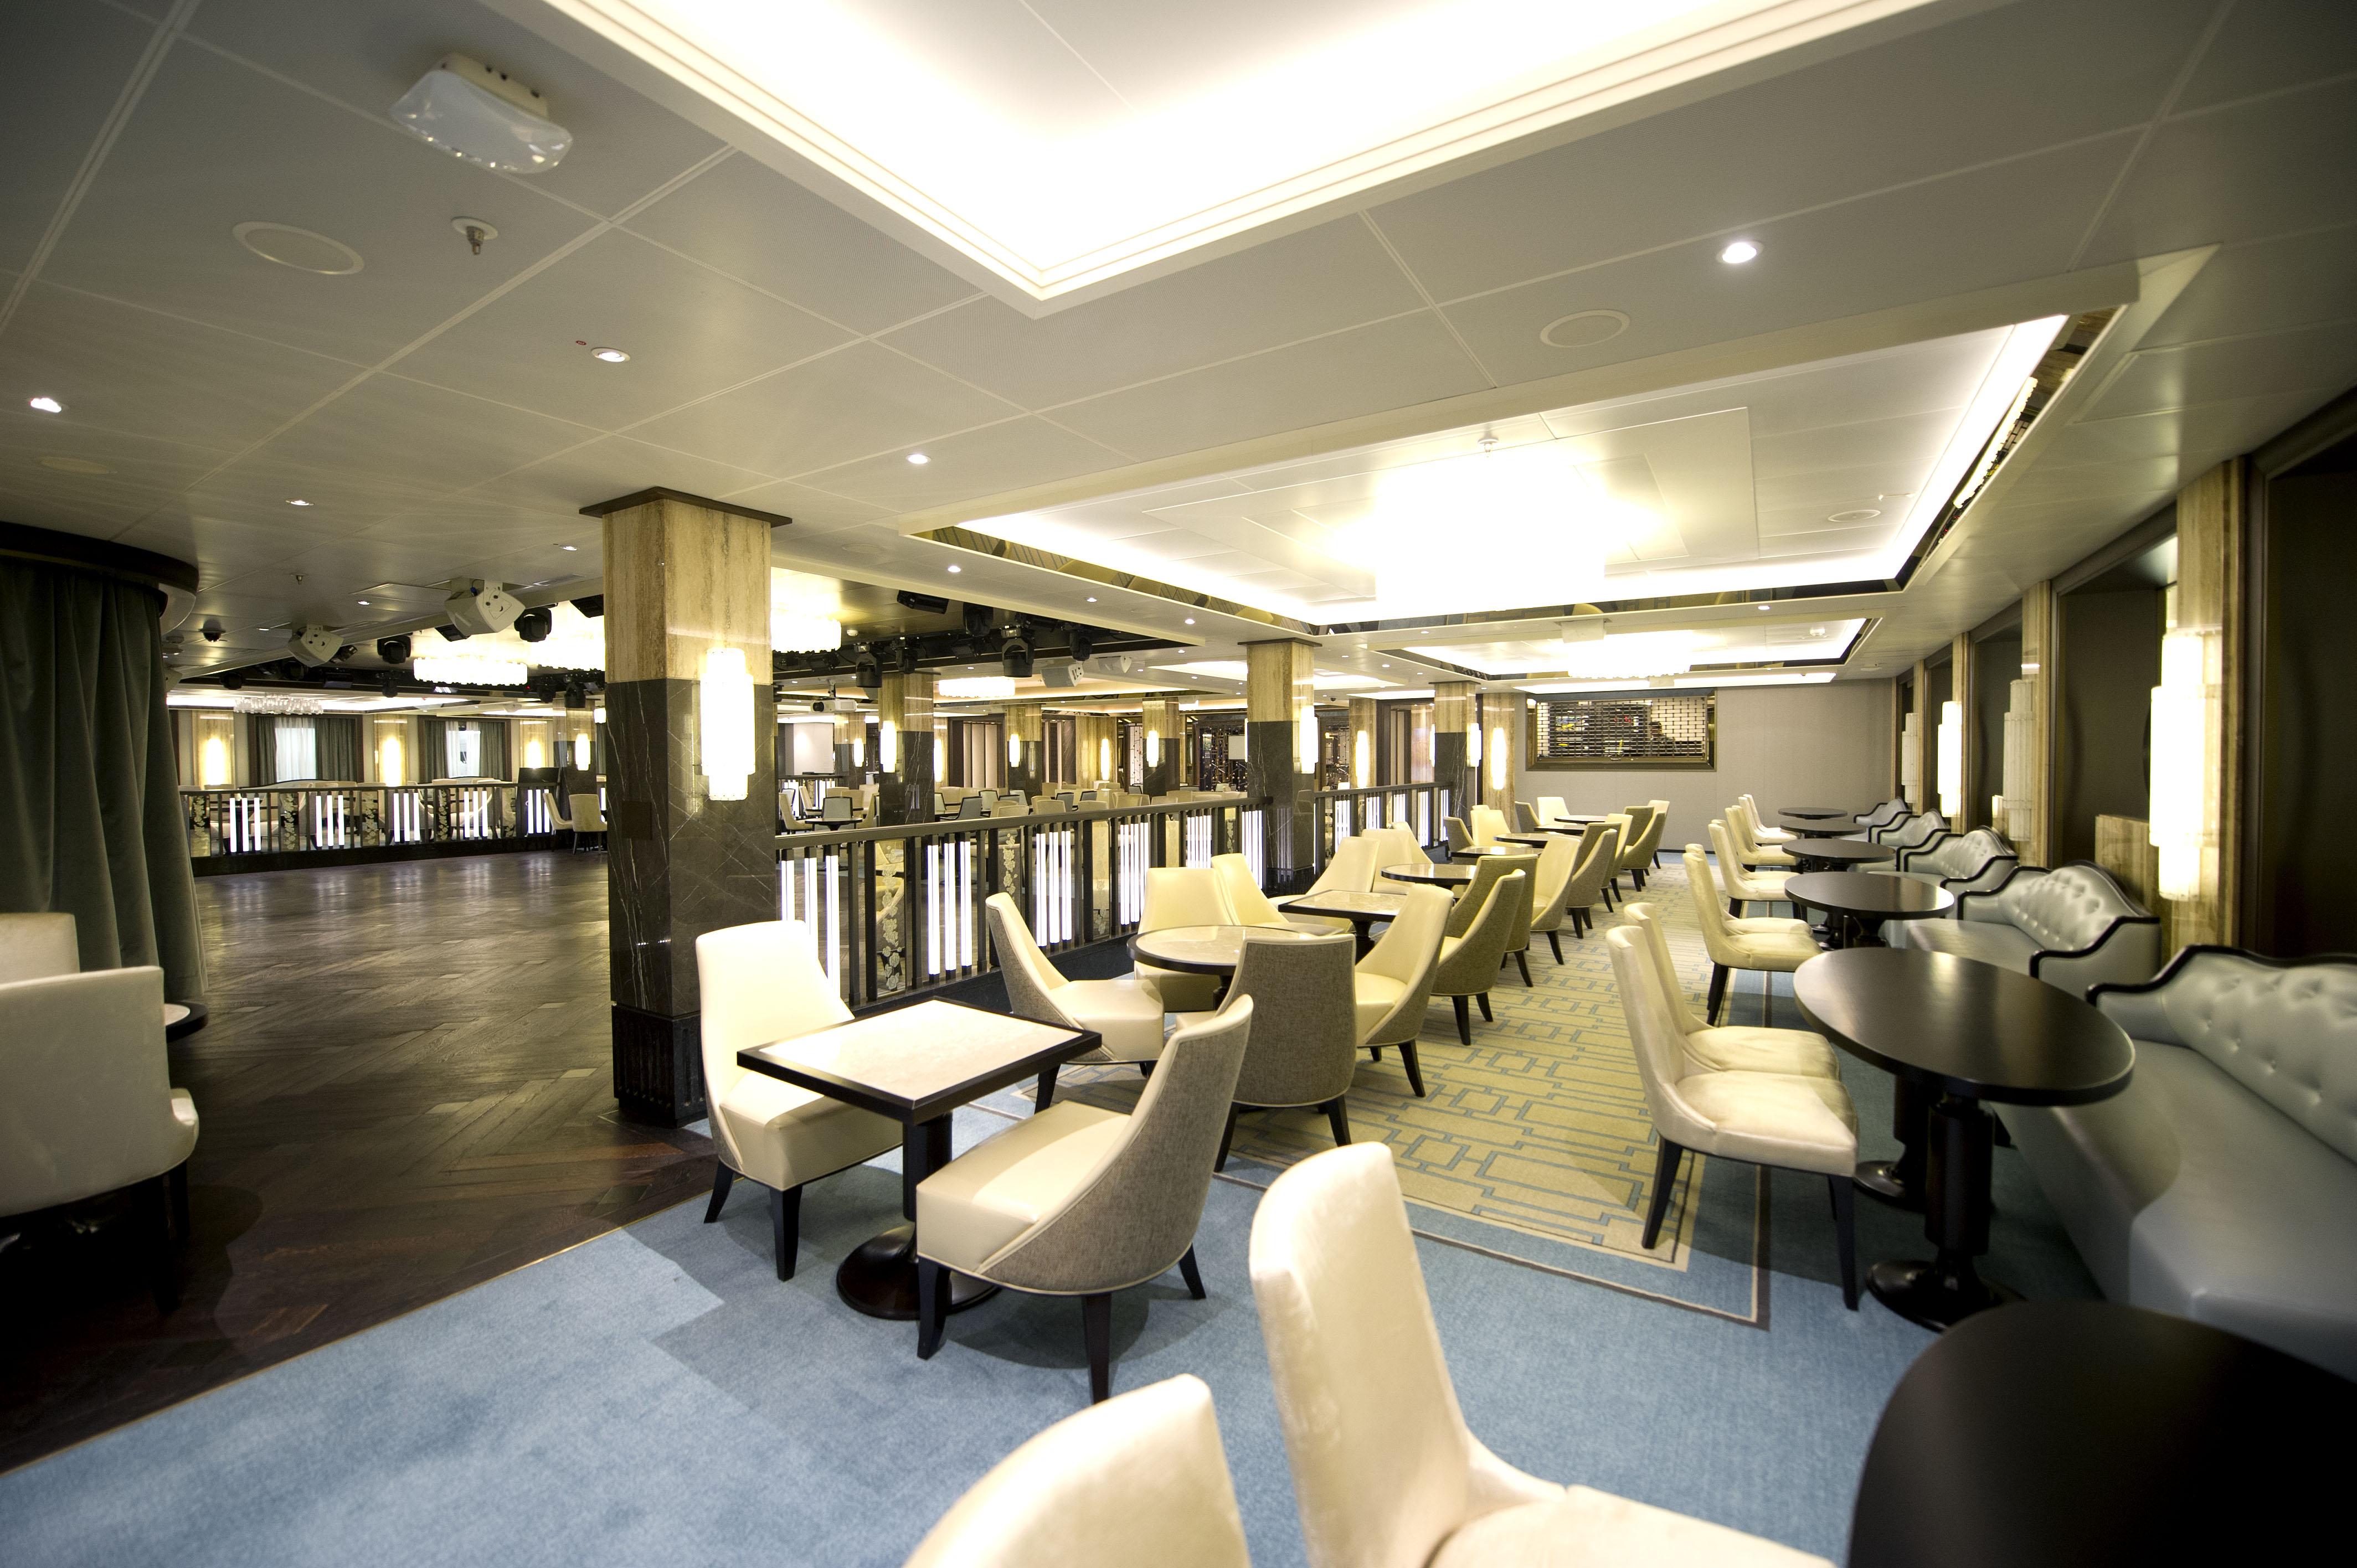 P&O Cruises Britannia Interior The Crystal Room Ds38347.jpg